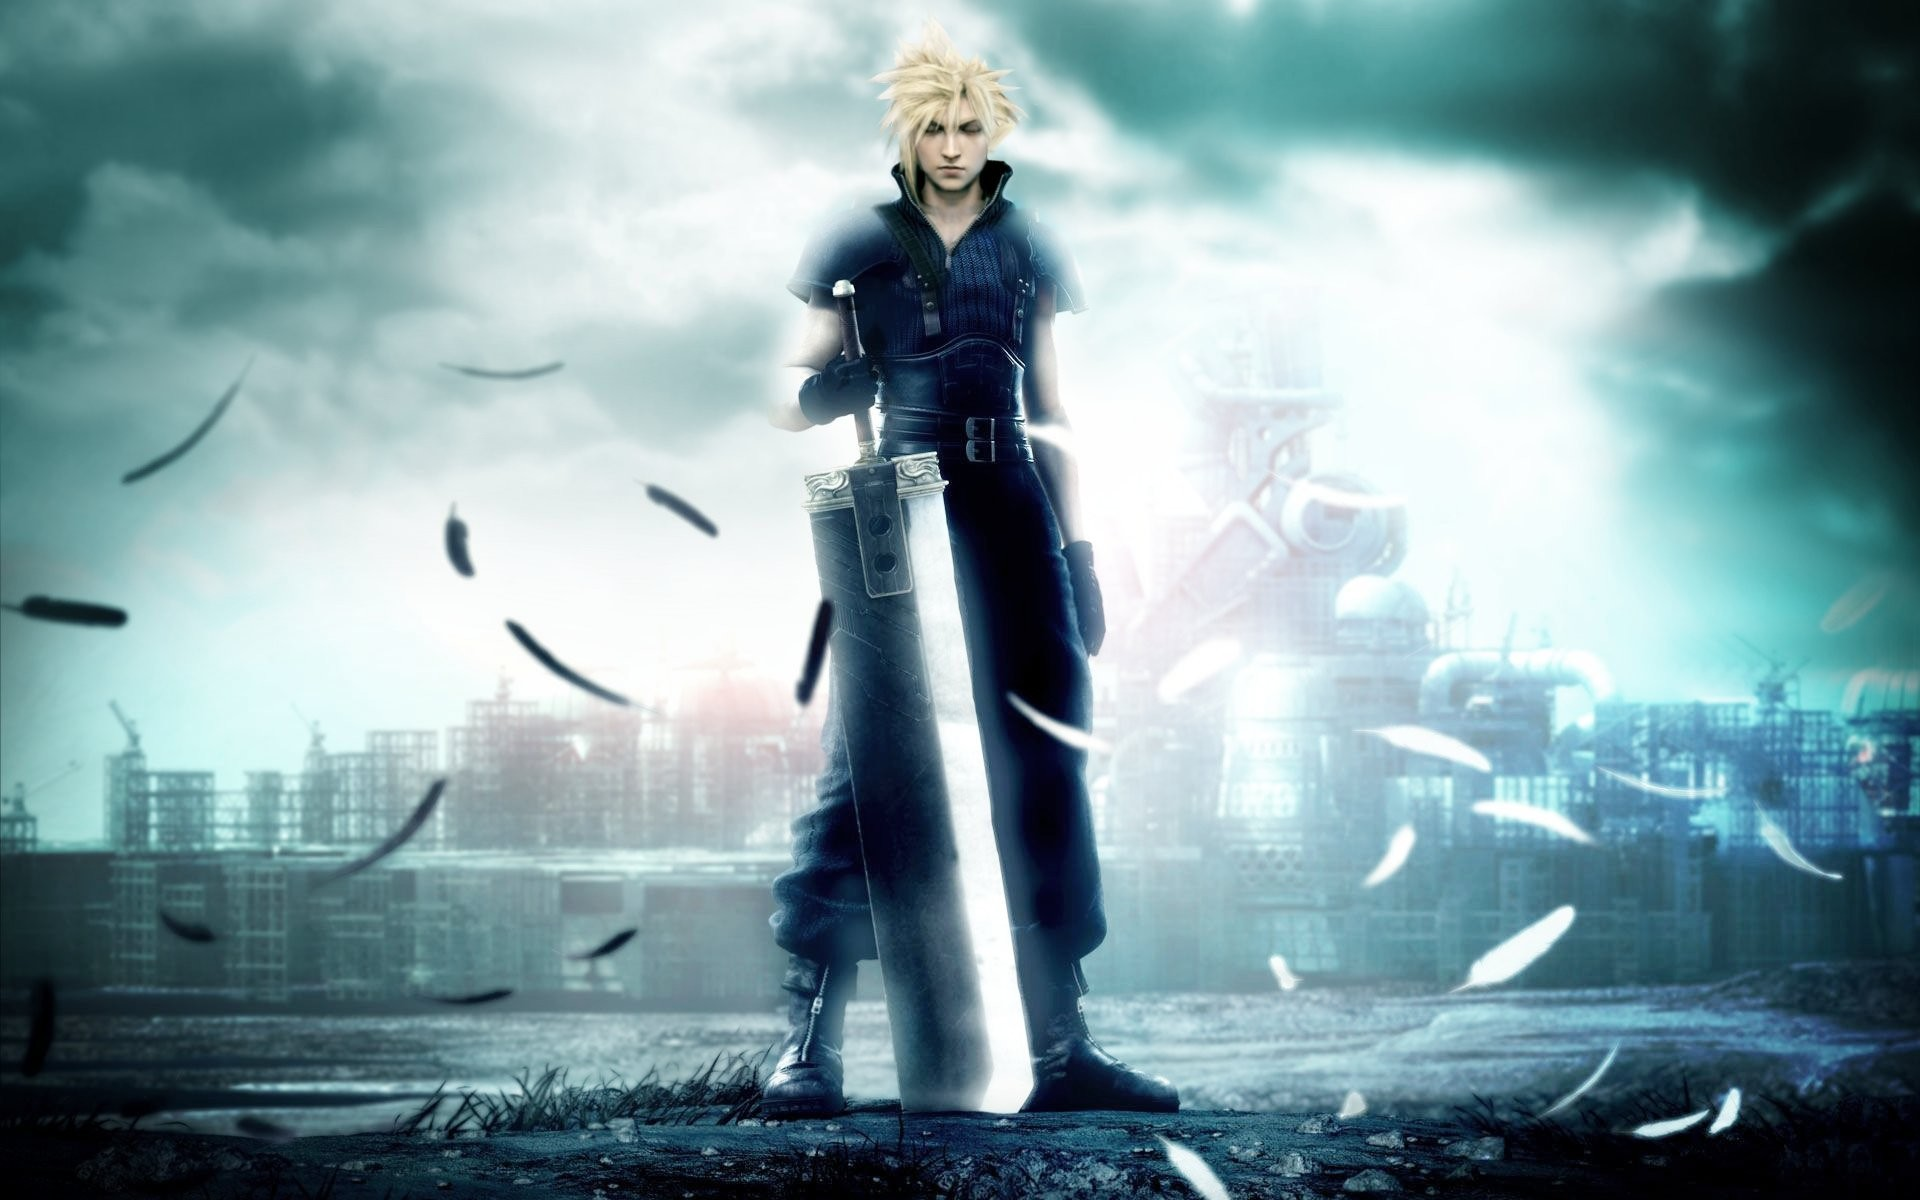 Final Fantasy HD Wallpapers Backgrounds Wallpaper · Cloud StrifeFinal …